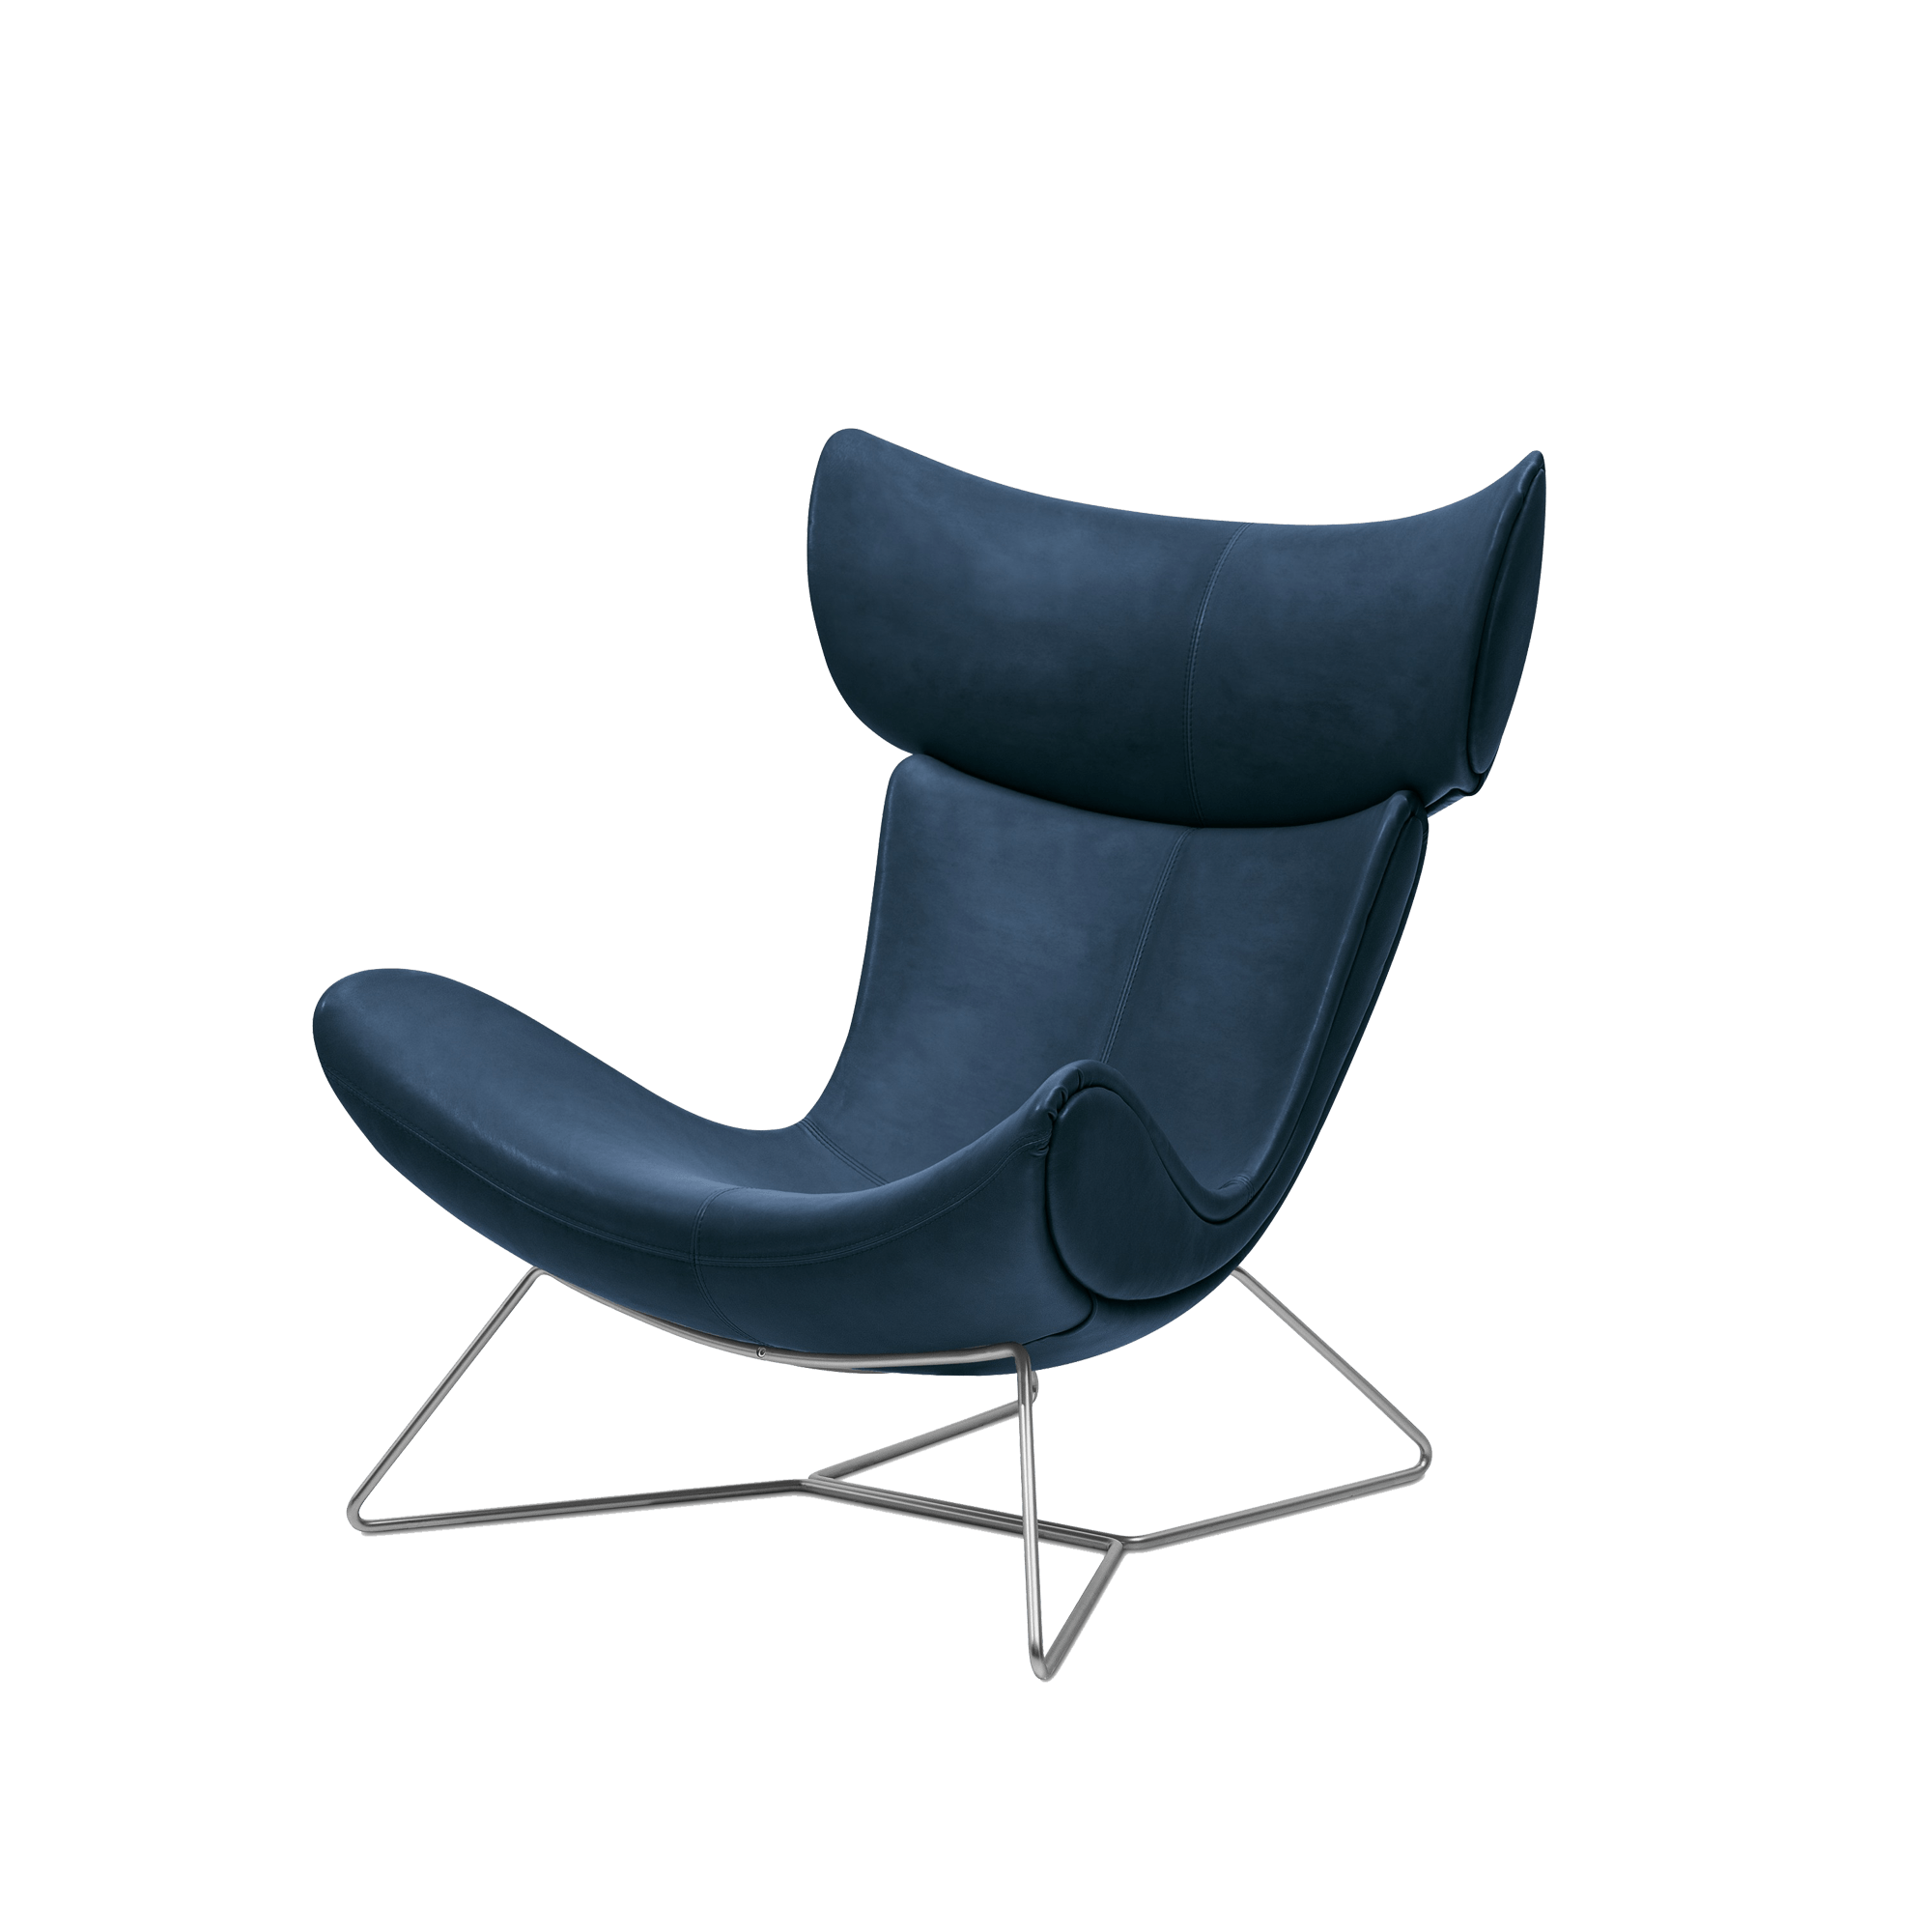 le fauteuil pi ce ma tresse du salon the socialite family. Black Bedroom Furniture Sets. Home Design Ideas